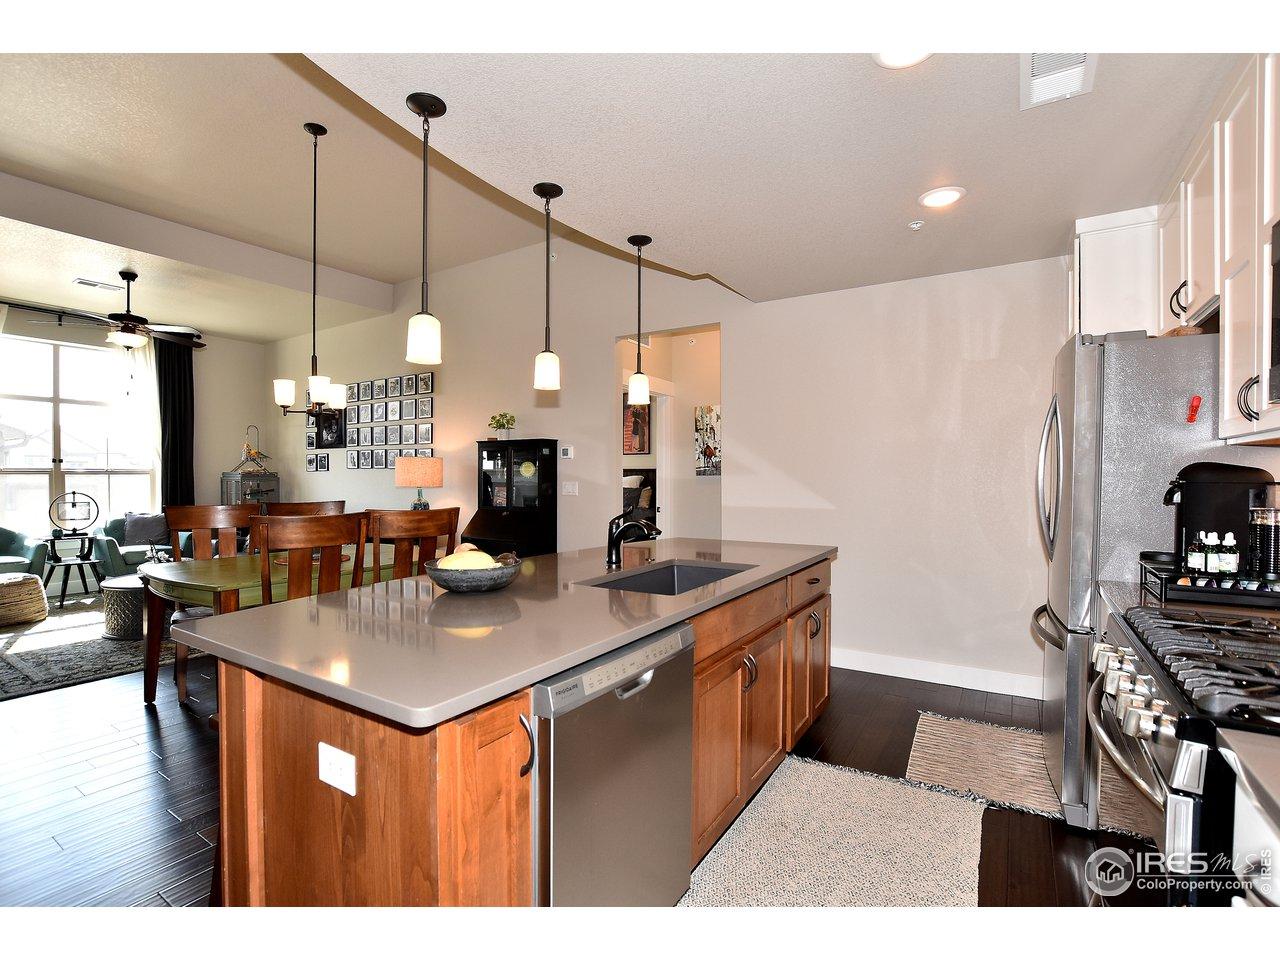 Perfect sized kitchen w/ quartz counters